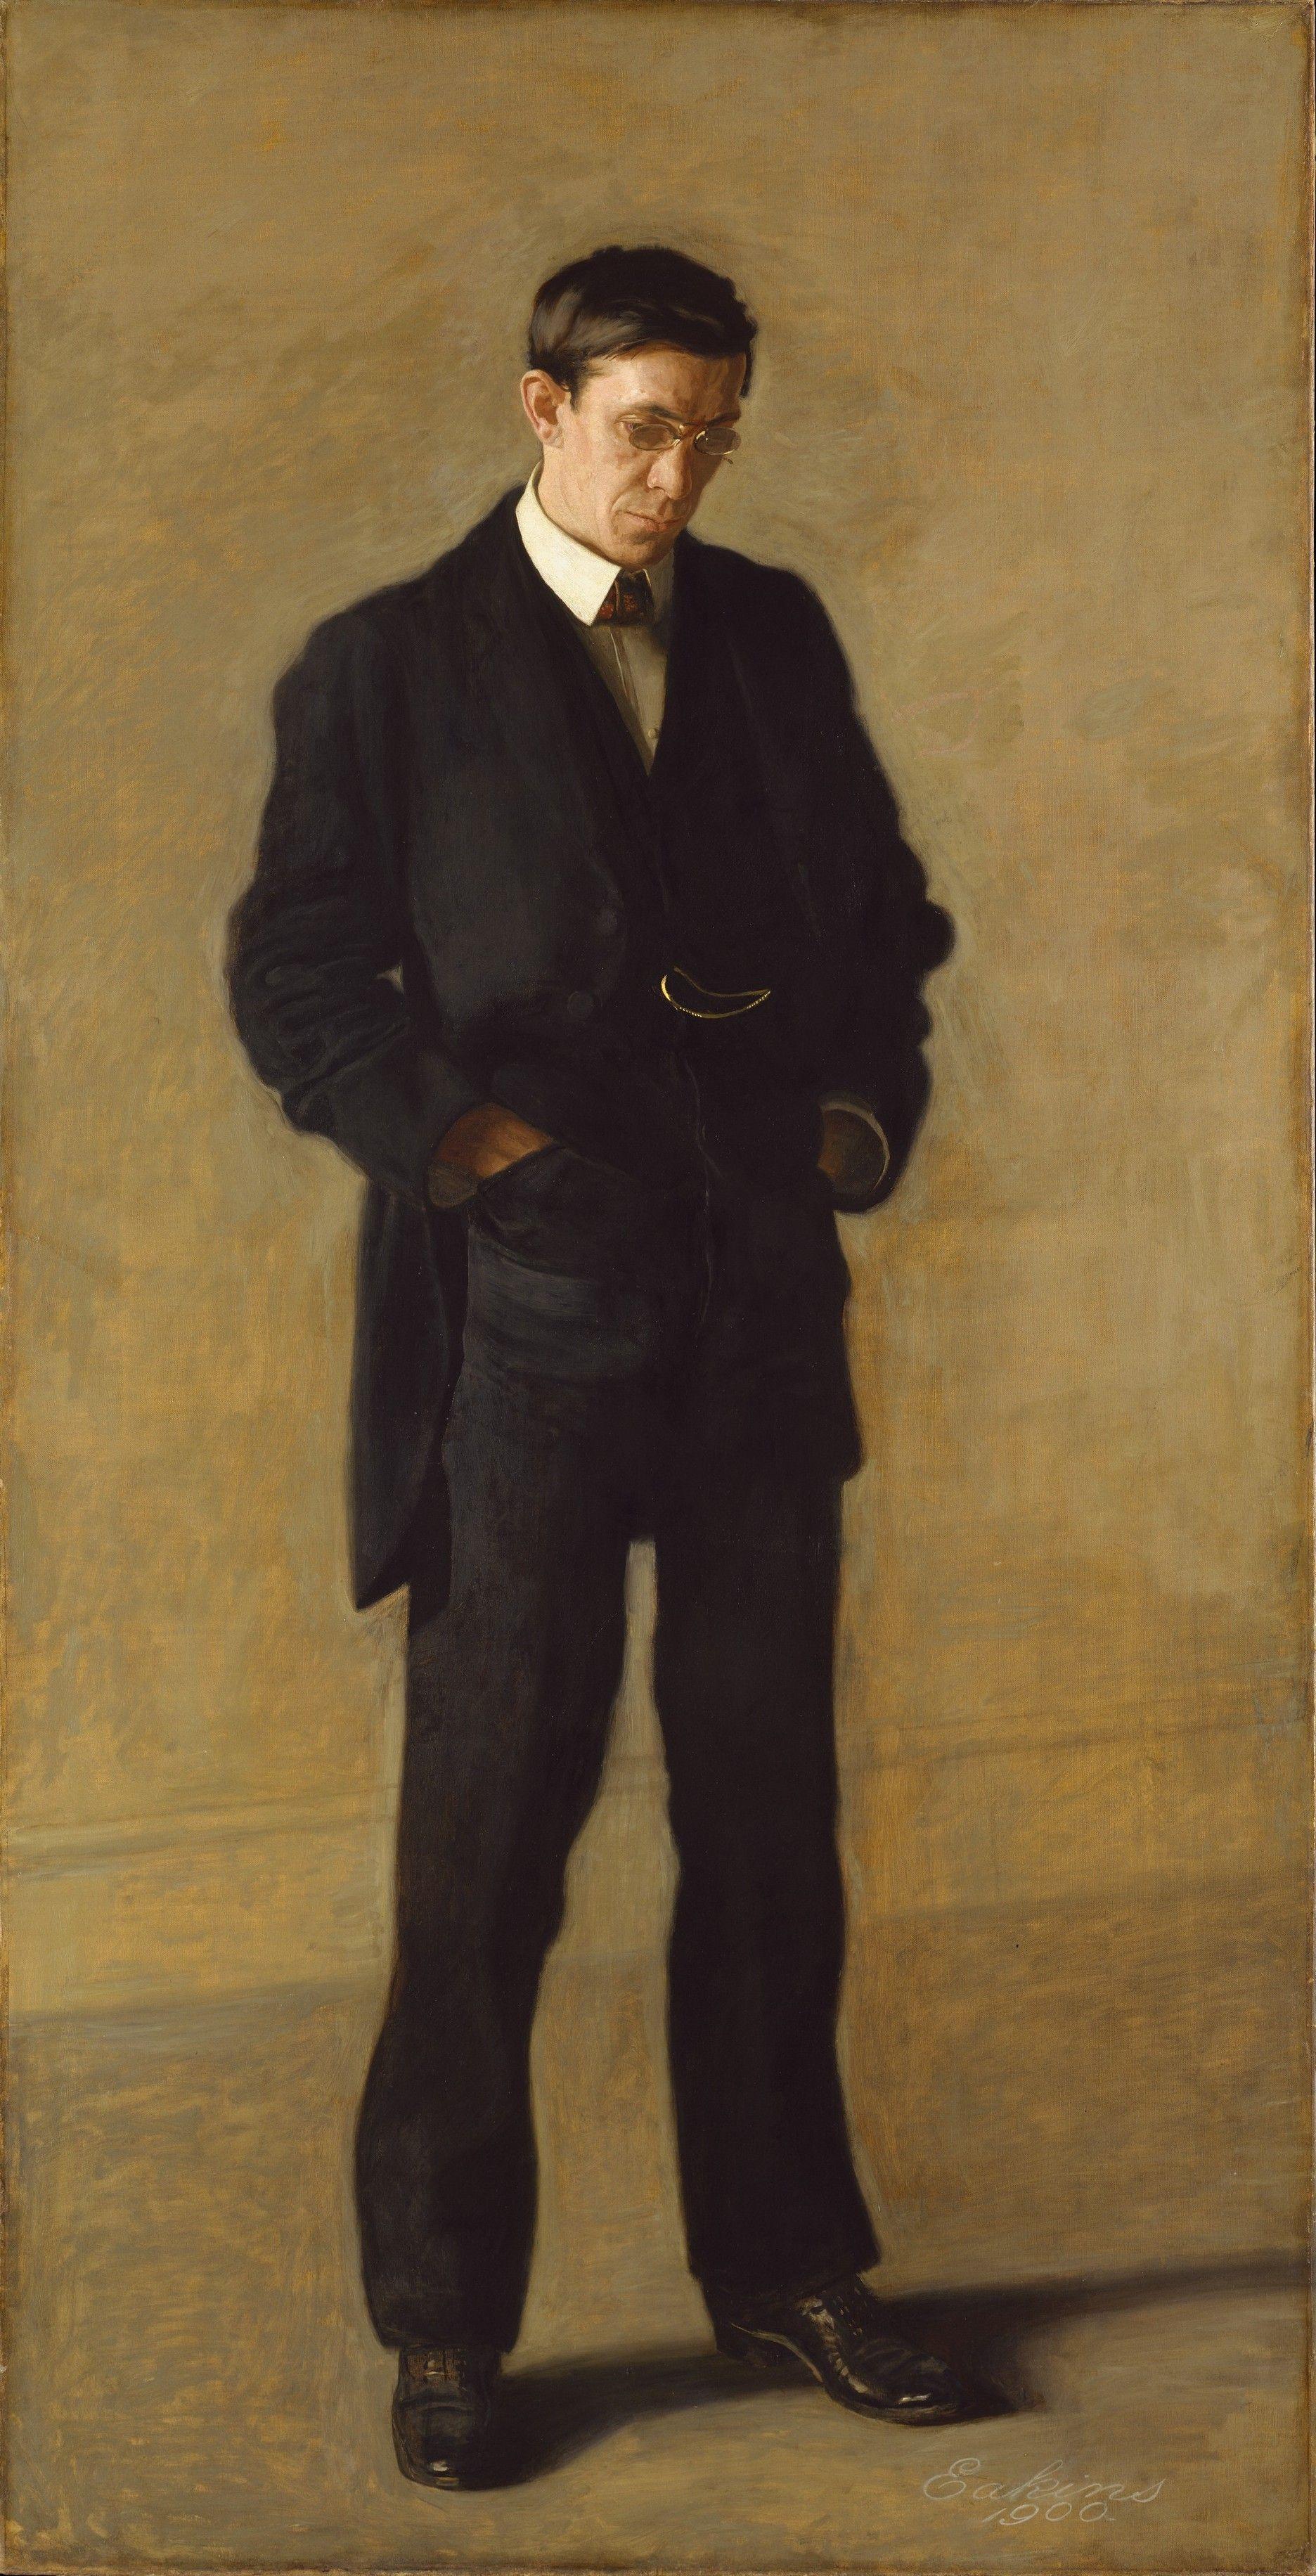 Thomas Eakins. The thinker, portrait of Louis N. Kenton